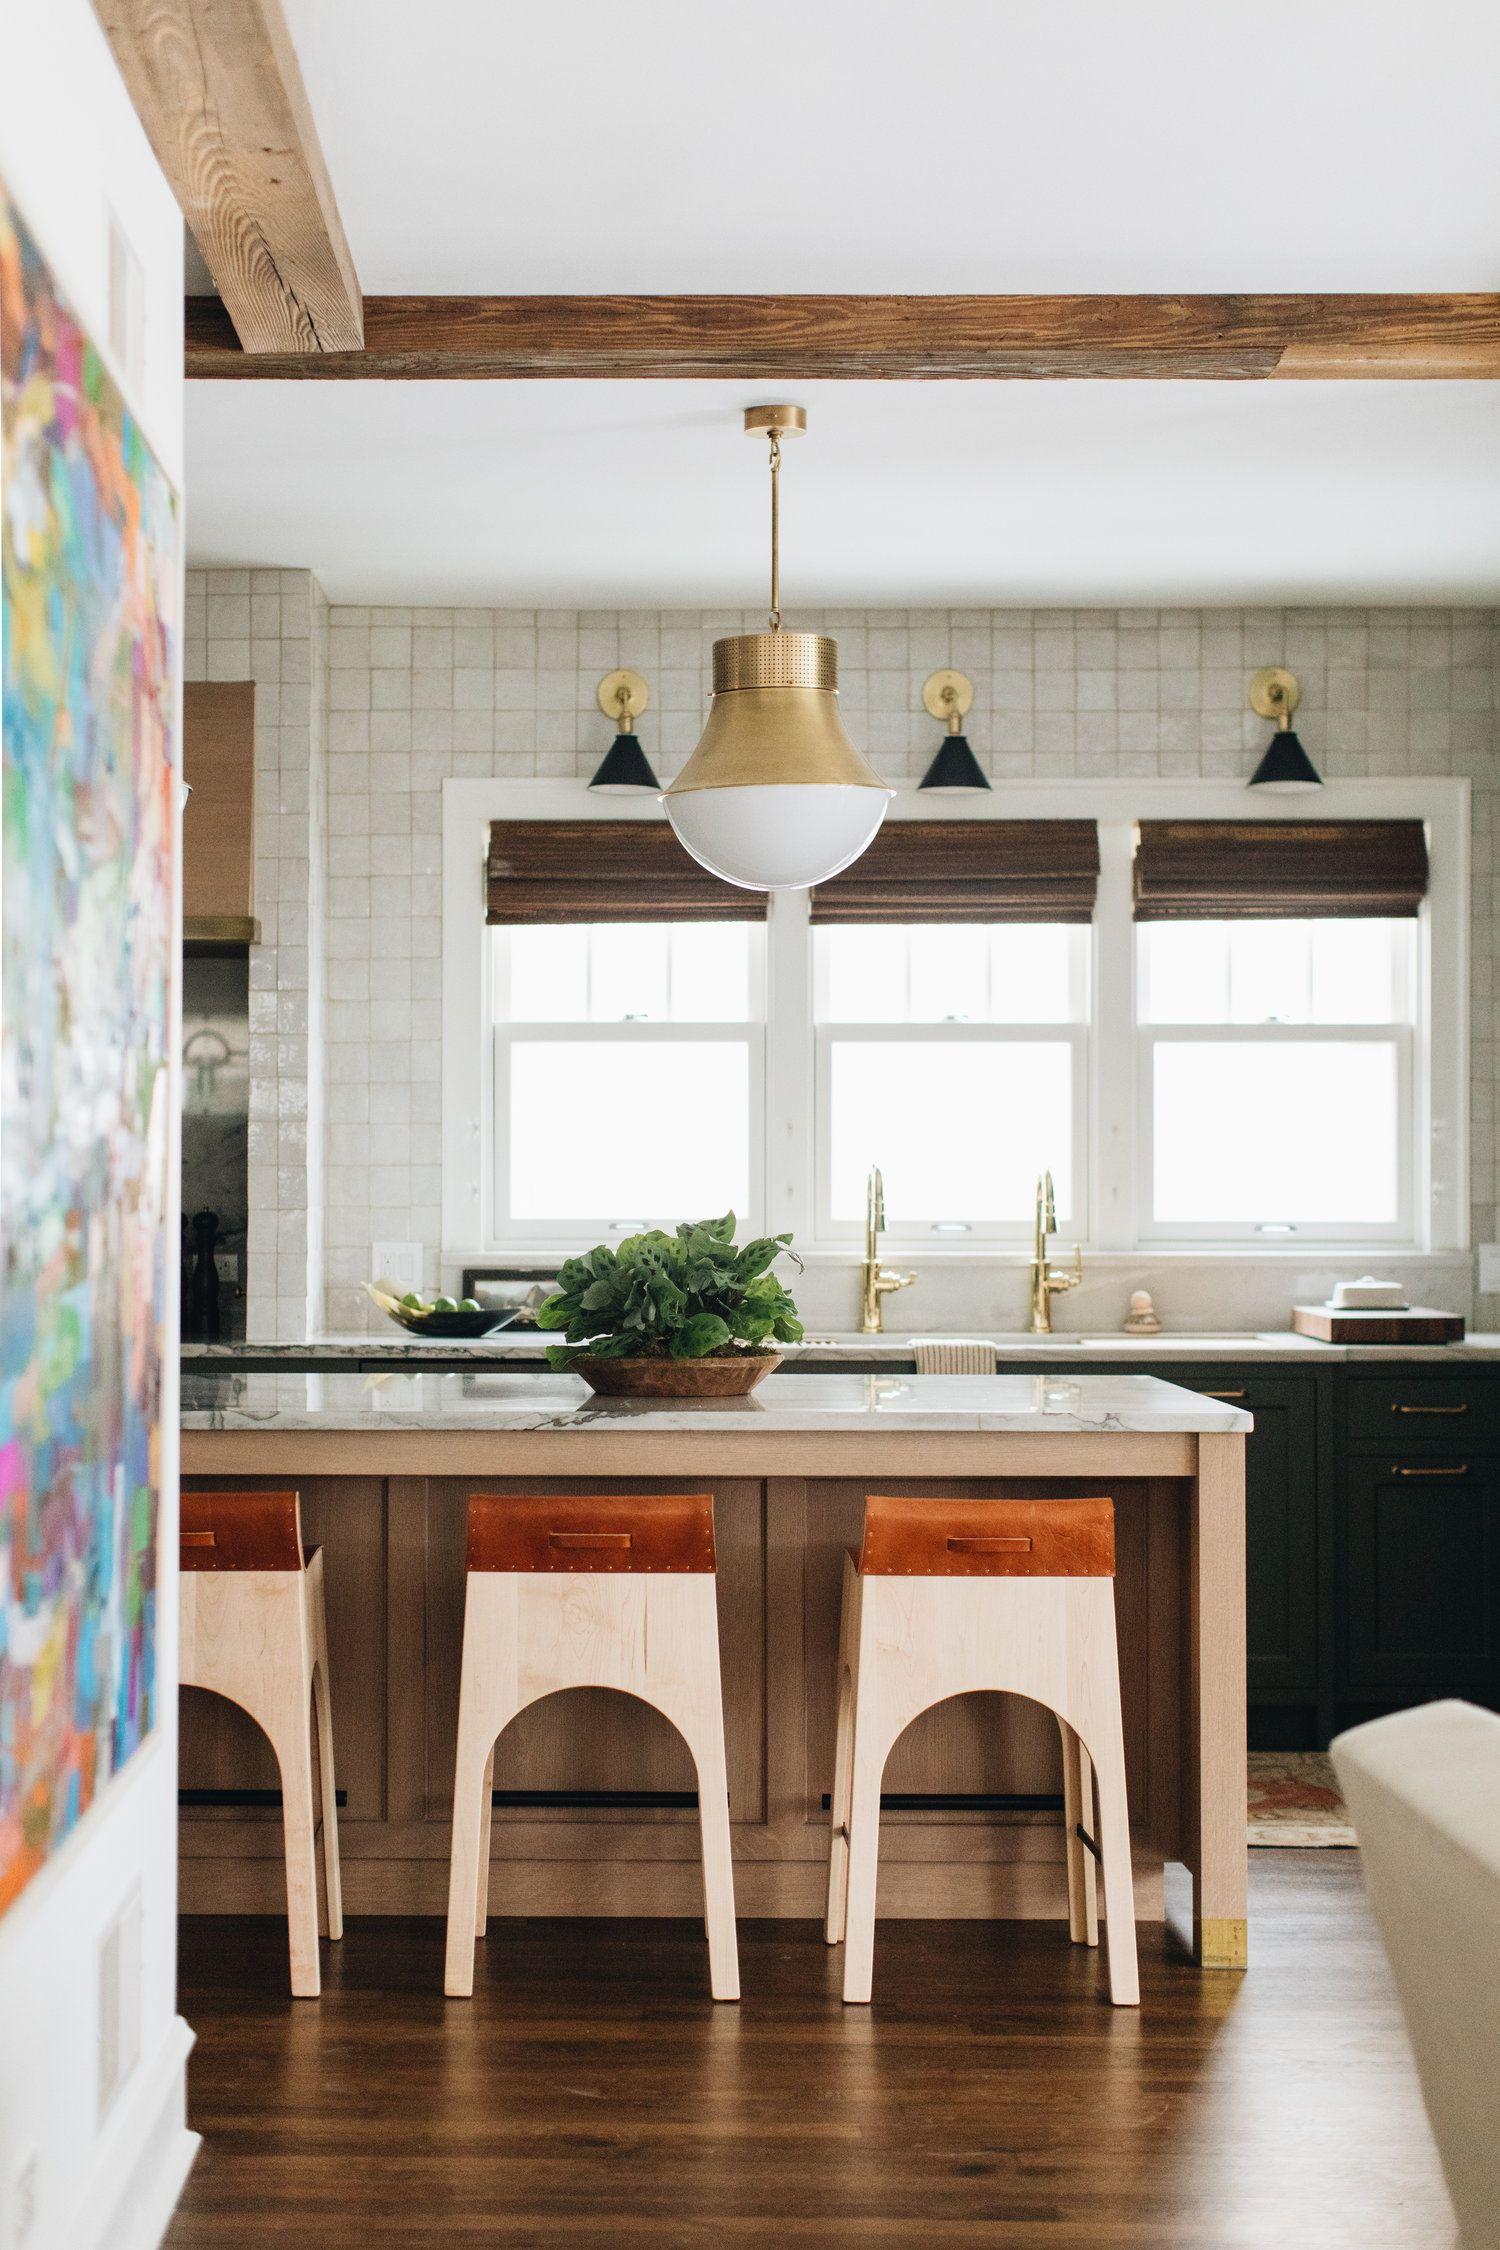 Fair Oaks Jean Stoffer Design Open Concept Kitchen Living Room Layout House Interior Decor Elegant Kitchens